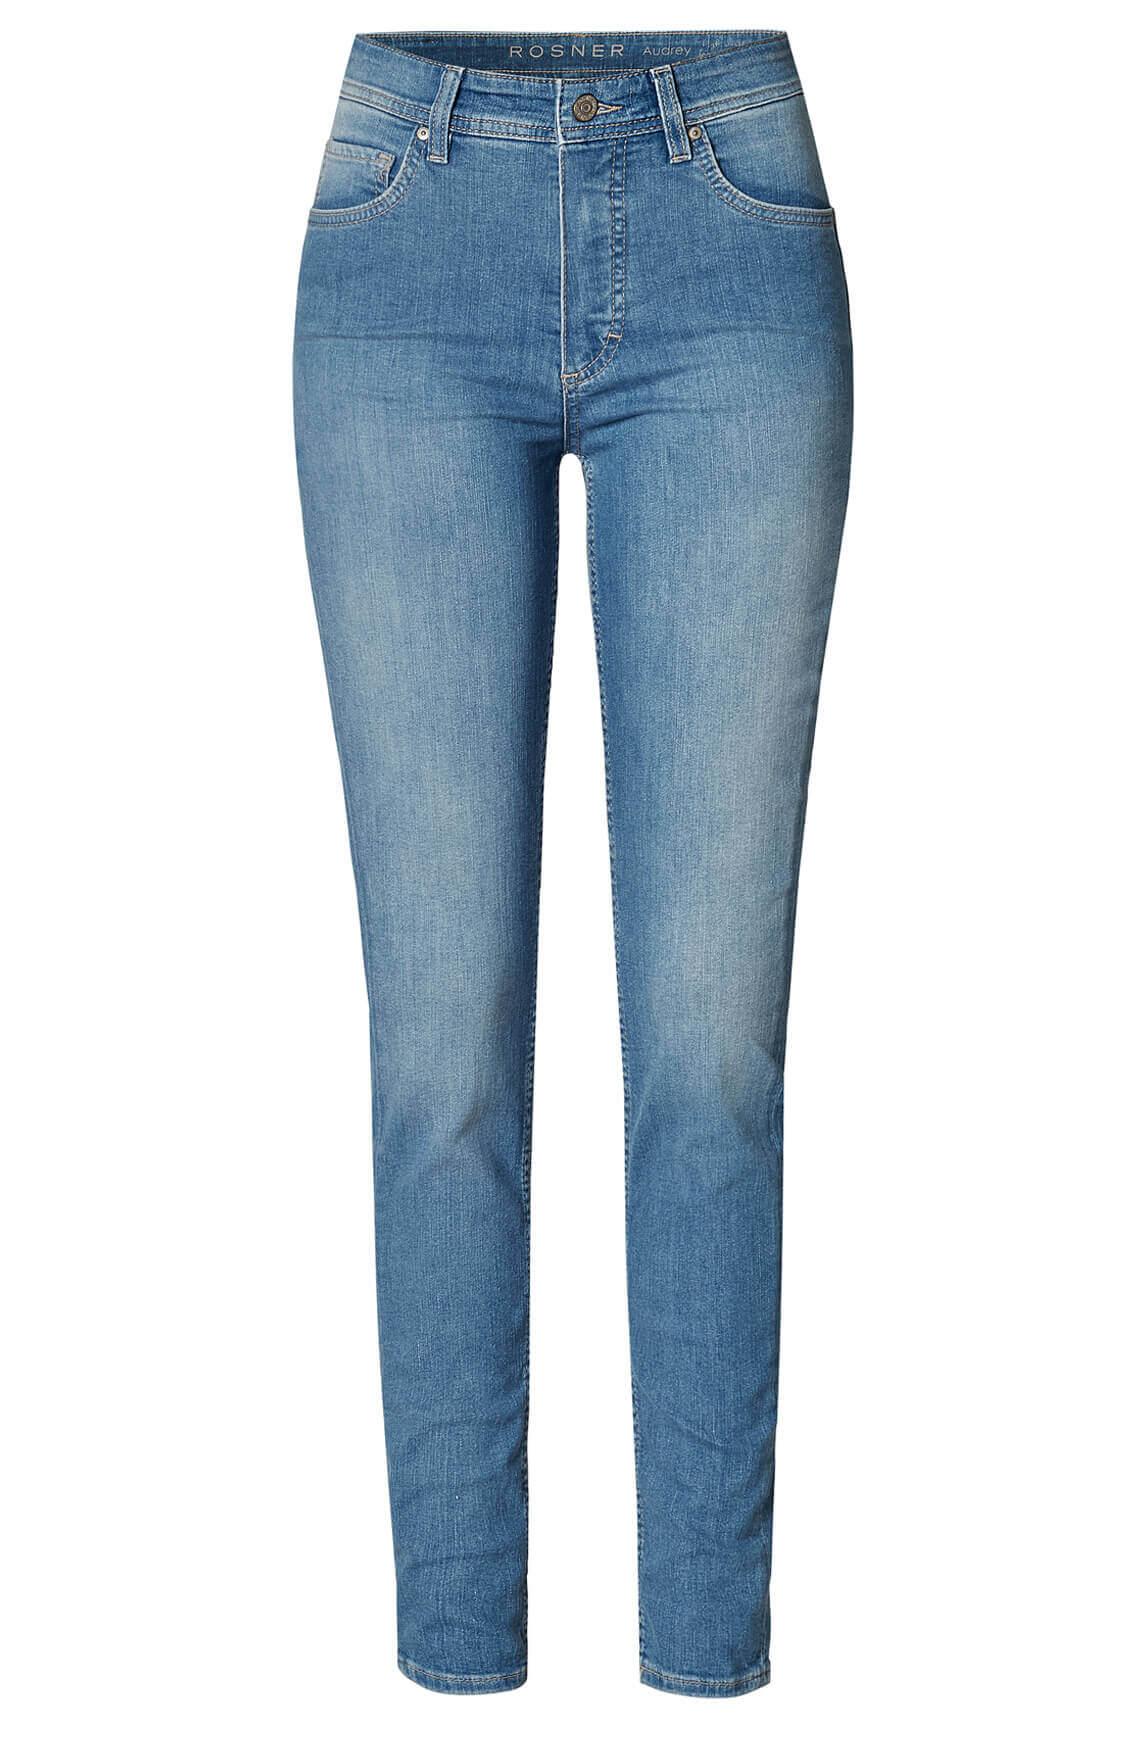 Rosner Dames Audrey high waist jeans L32 Blauw